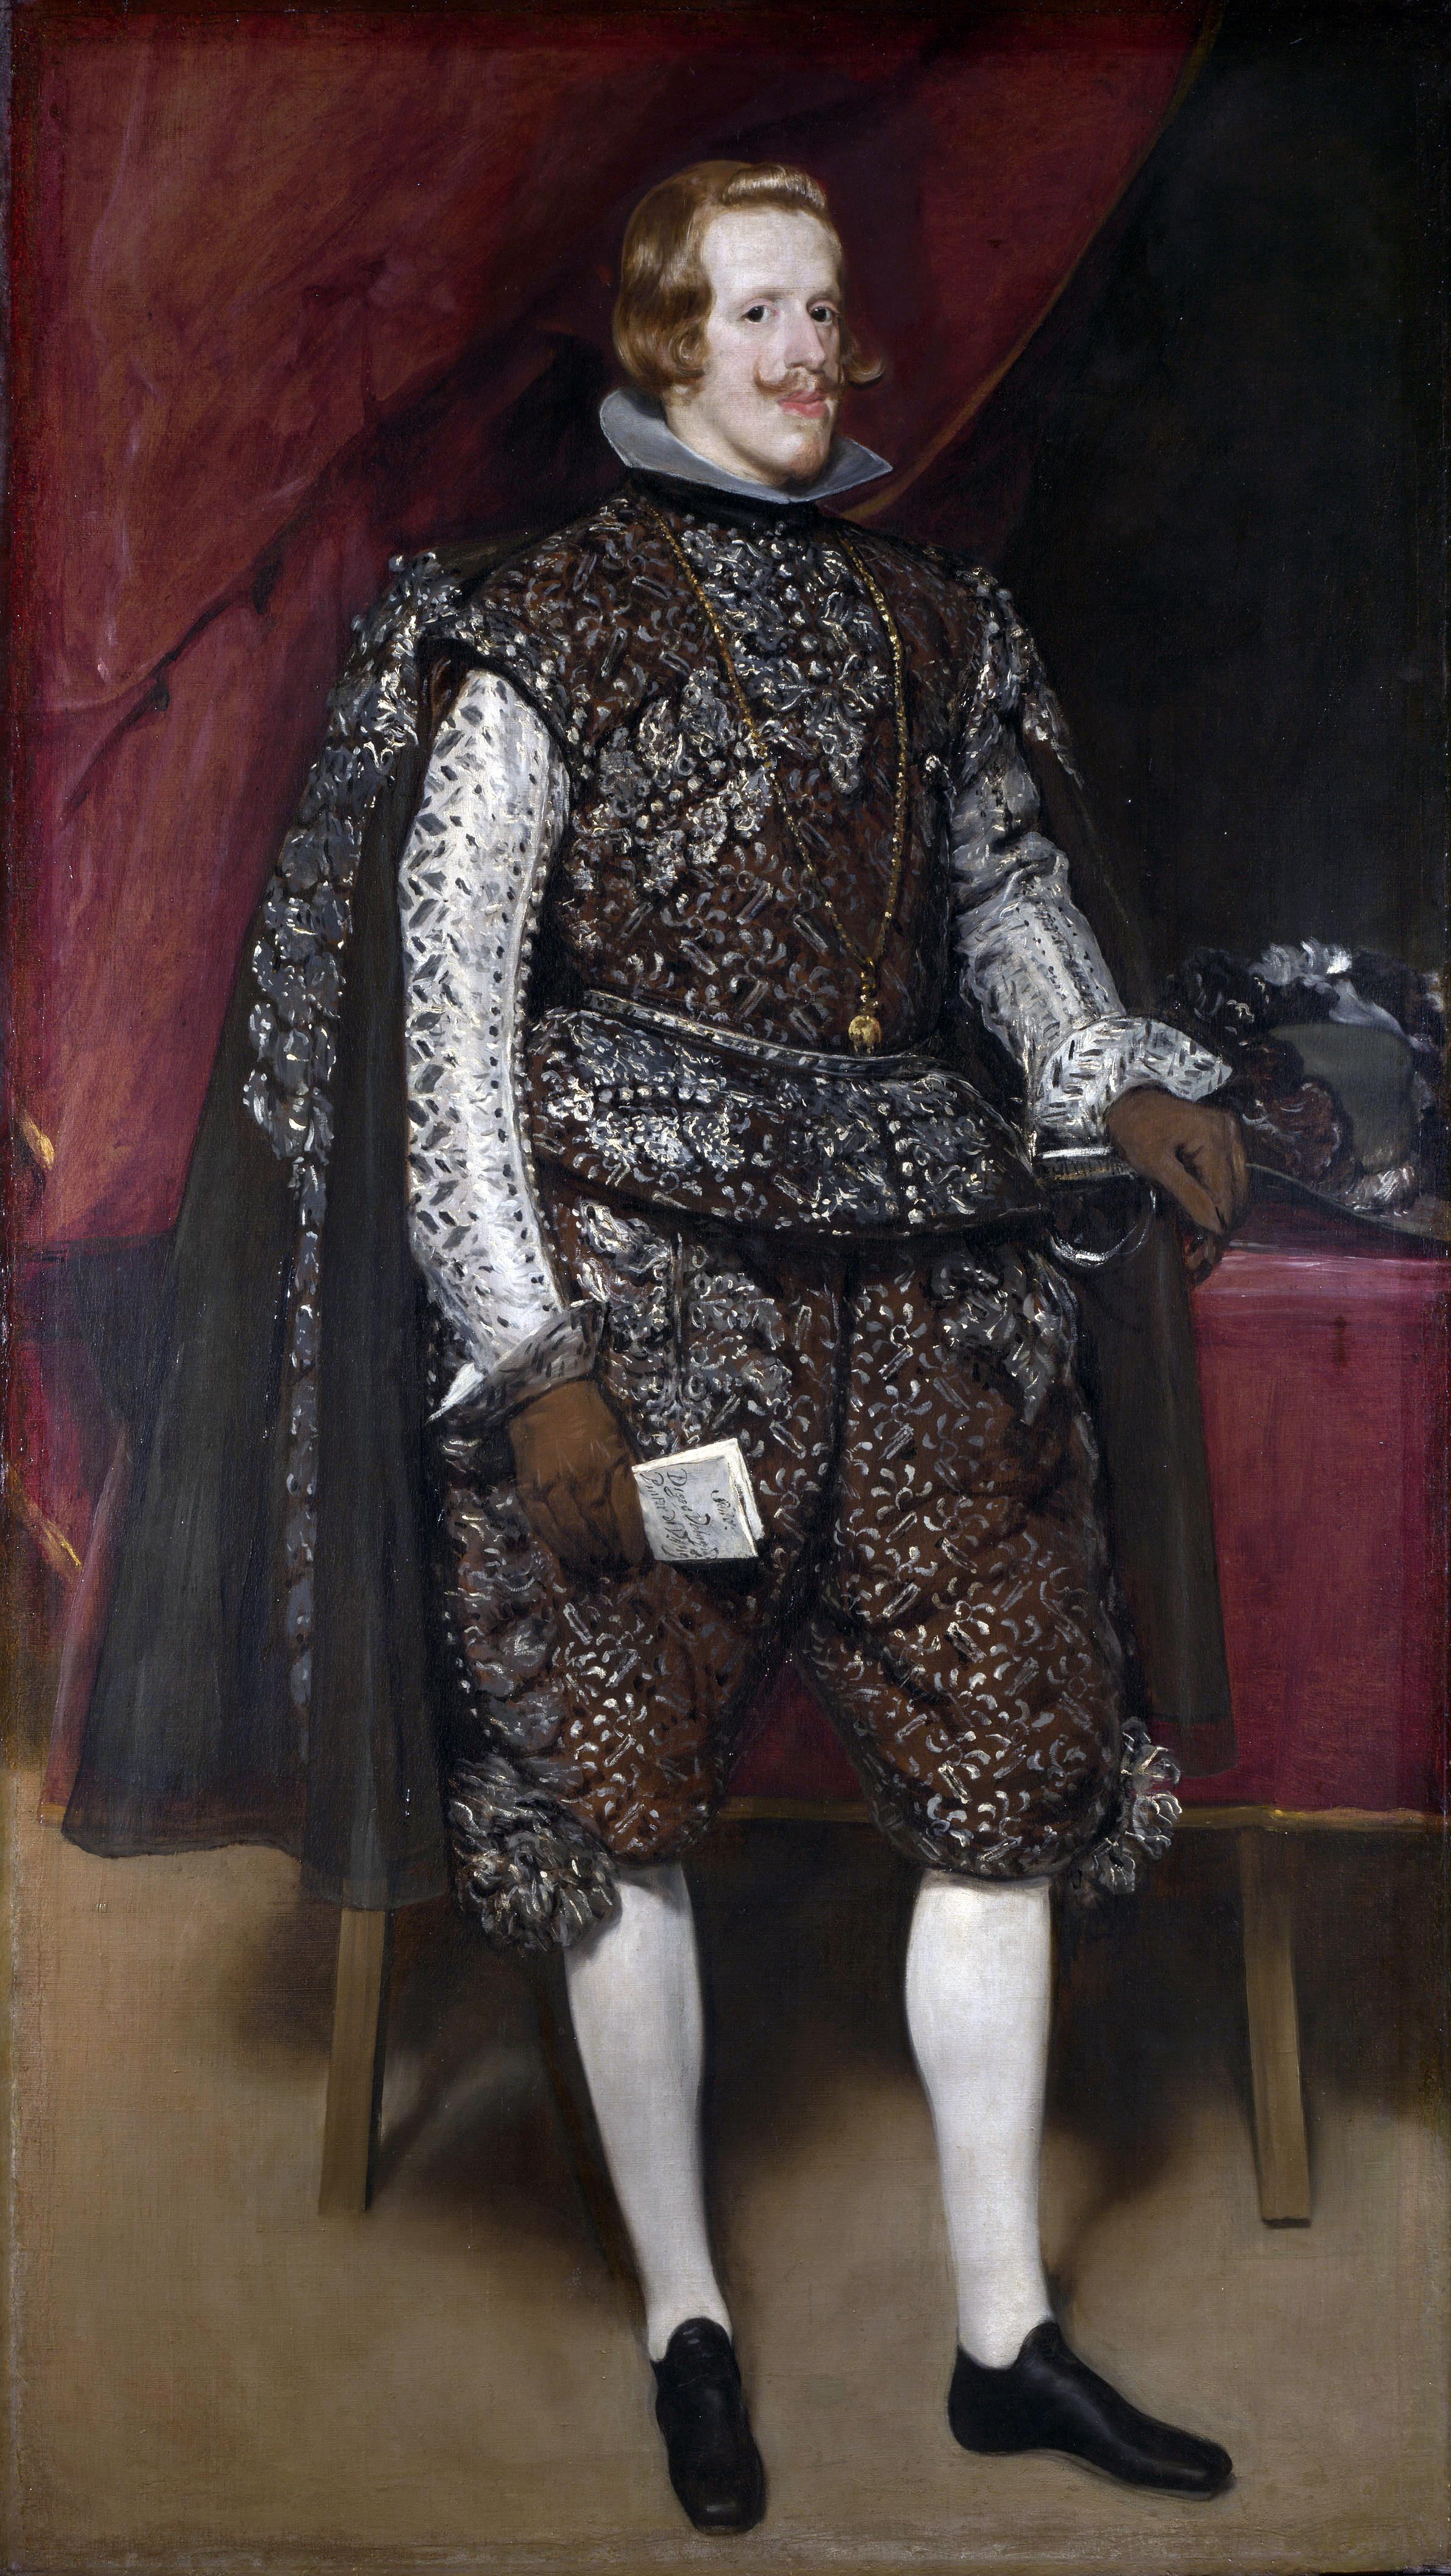 File:Felipe IV de castaño y plata, by Diego Velázquez.jpg